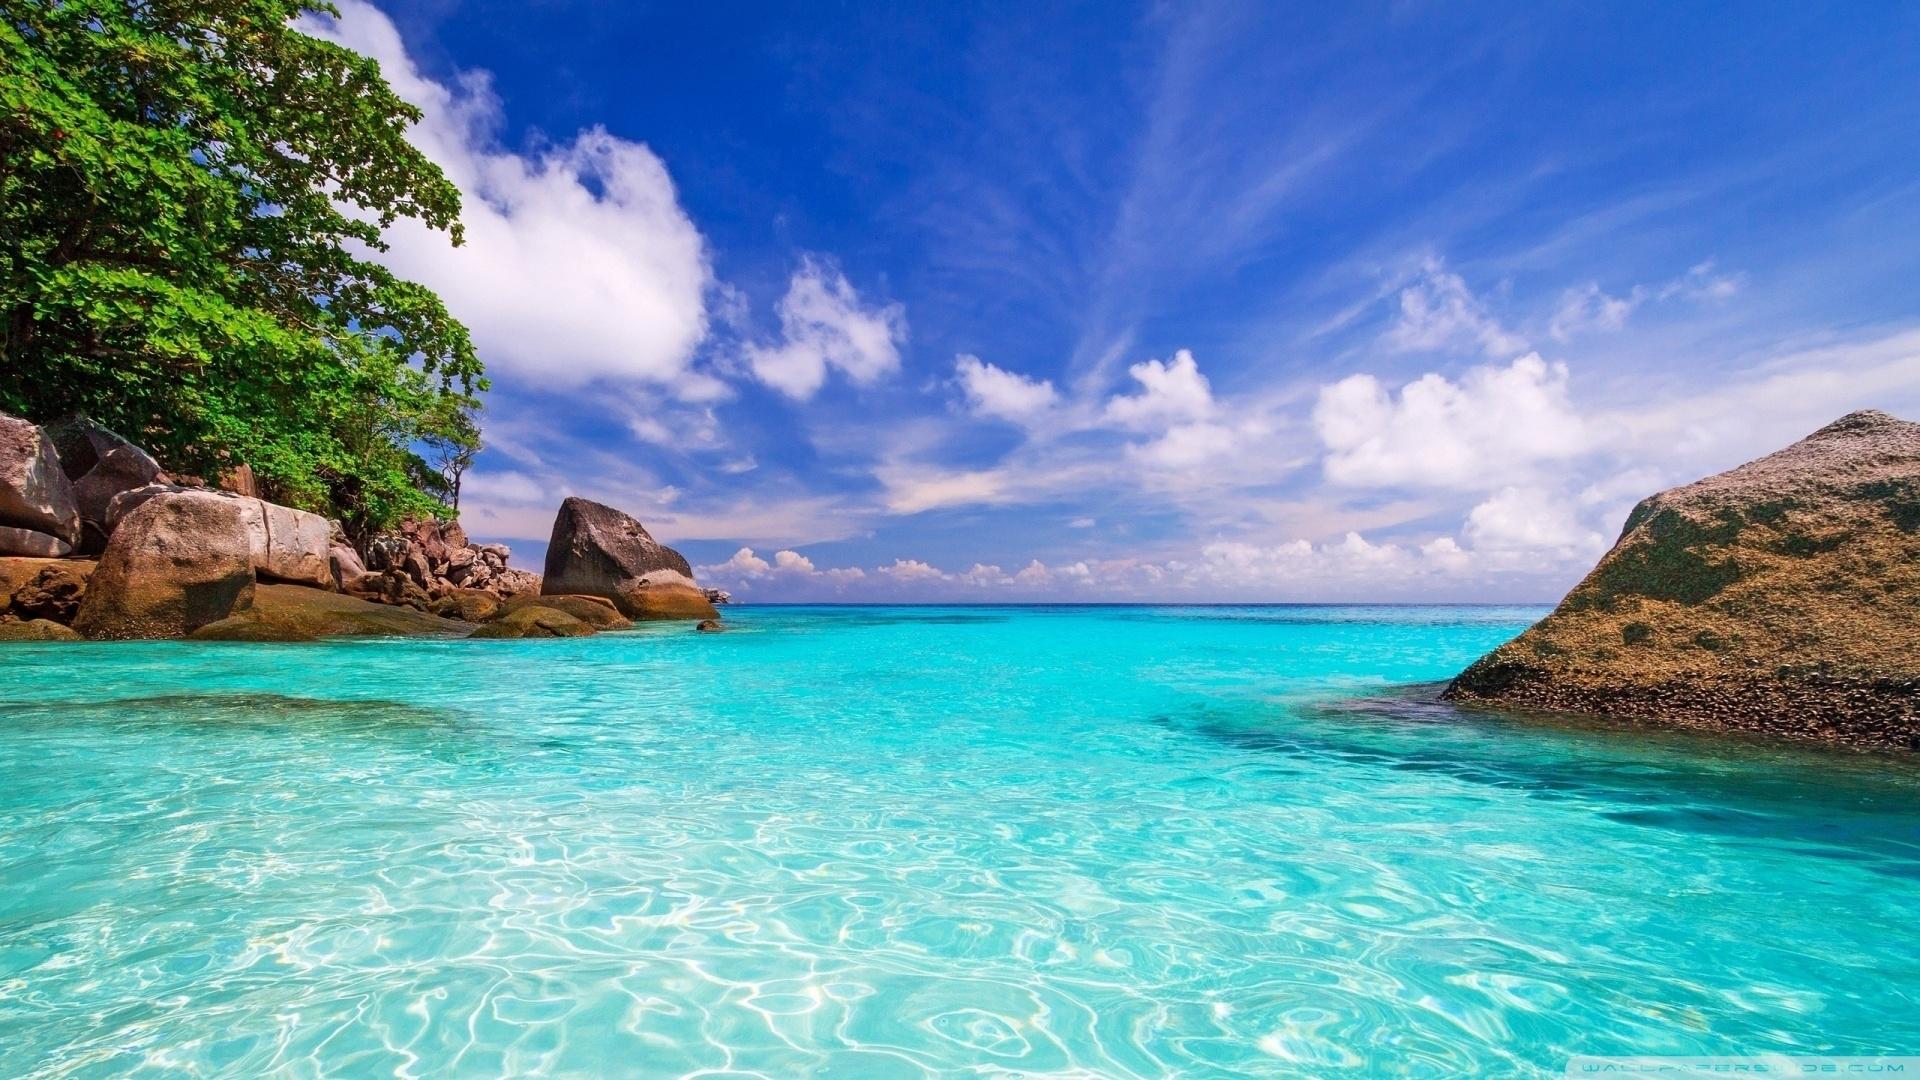 beach day ❤ 4k hd desktop wallpaper for 4k ultra hd tv • dual